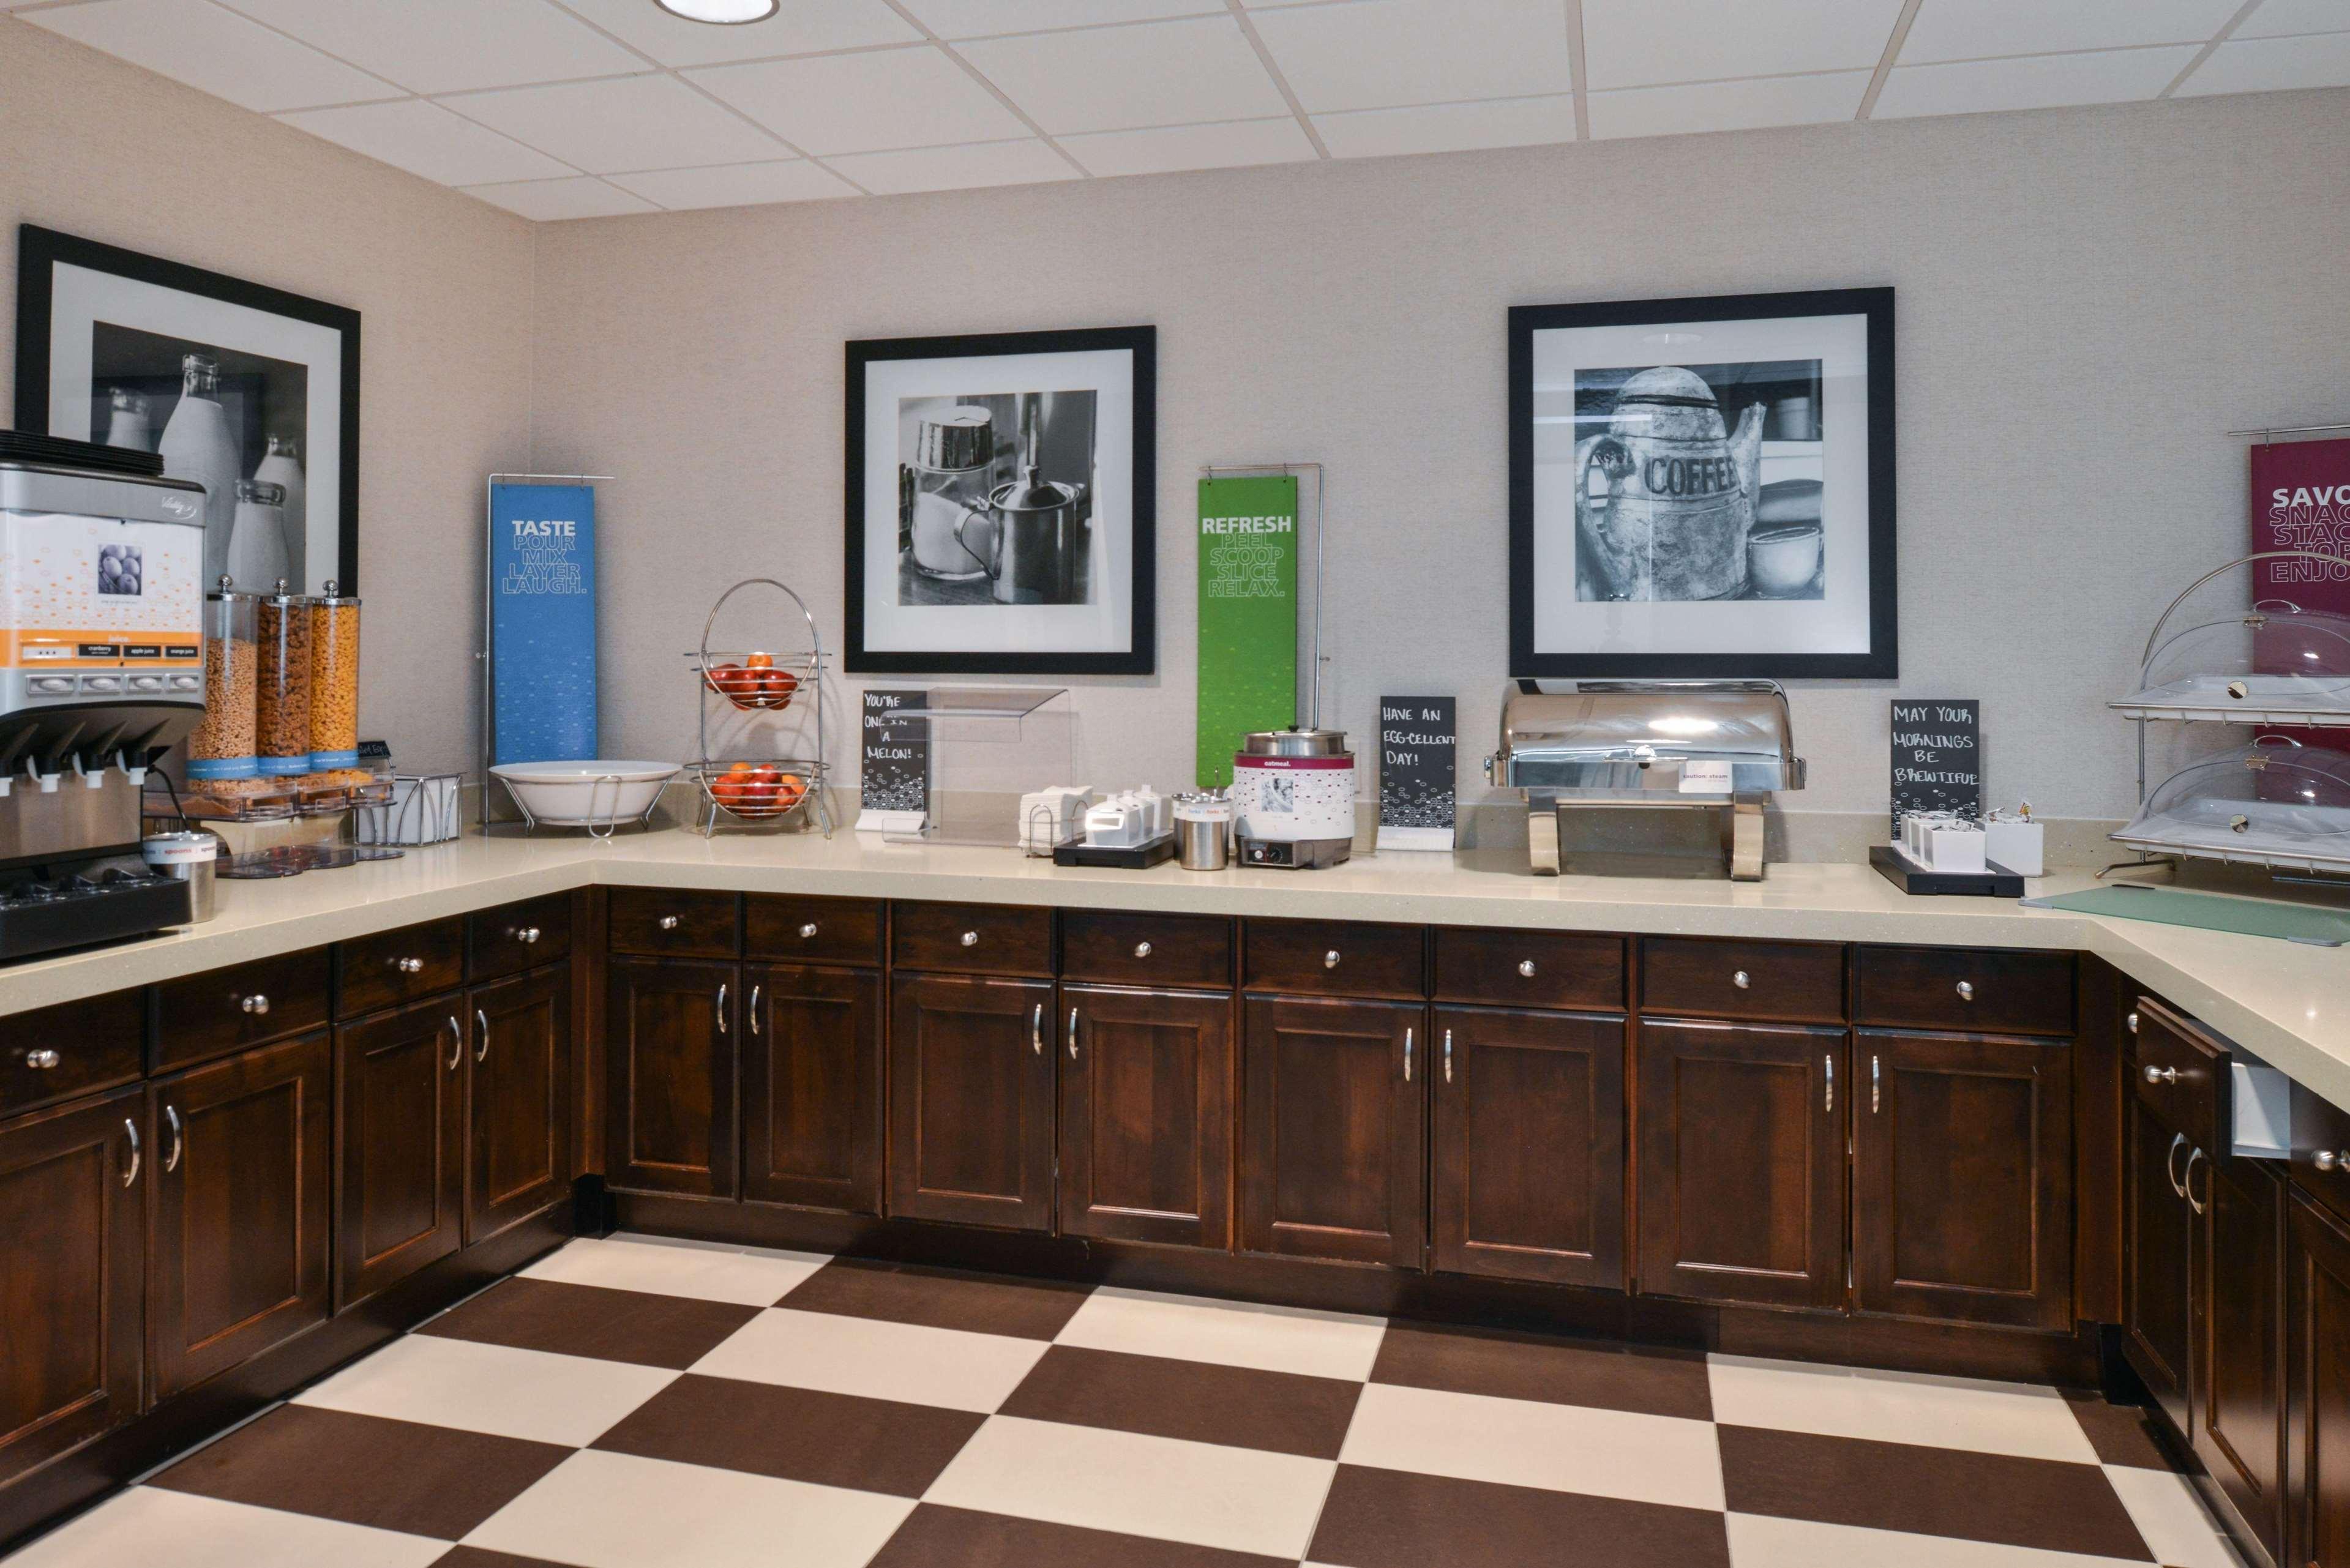 Hampton Inn & Suites Denver-Speer Boulevard image 48